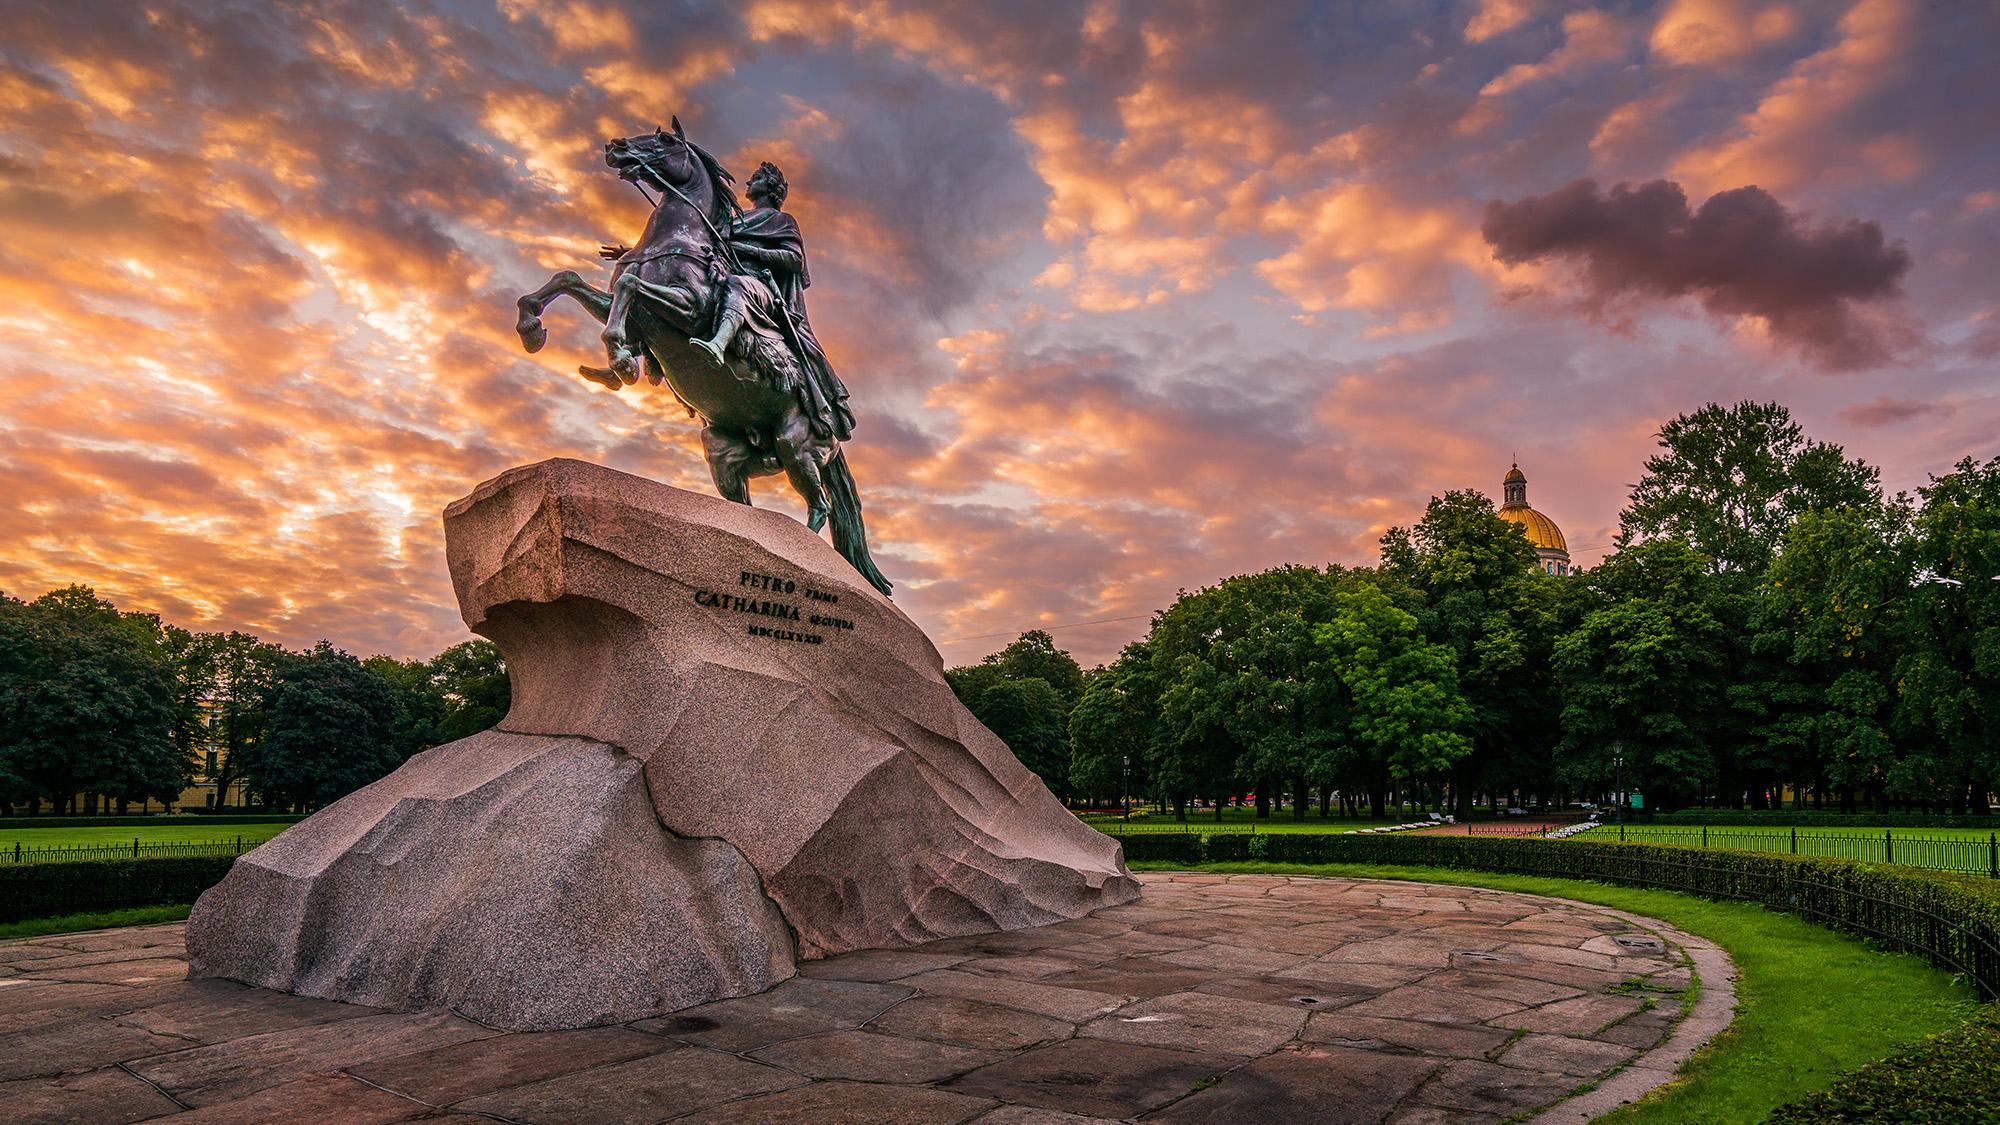 Bronze Horseman - Peter the Great Statue, Russian Federation